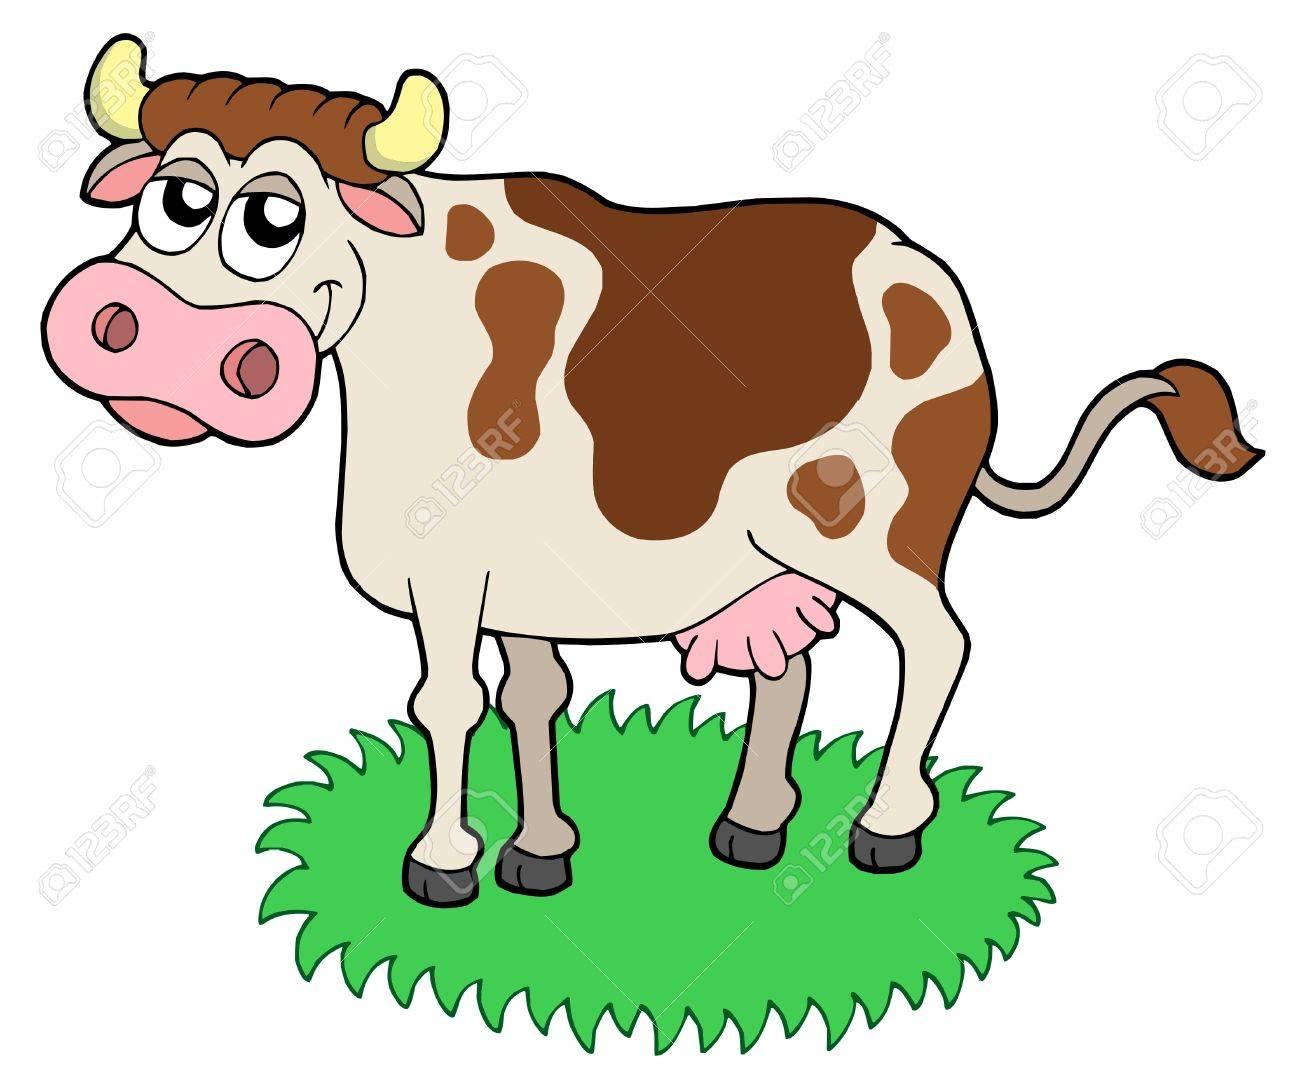 Cute cow - vector illustration. Stock Vector - 4012150